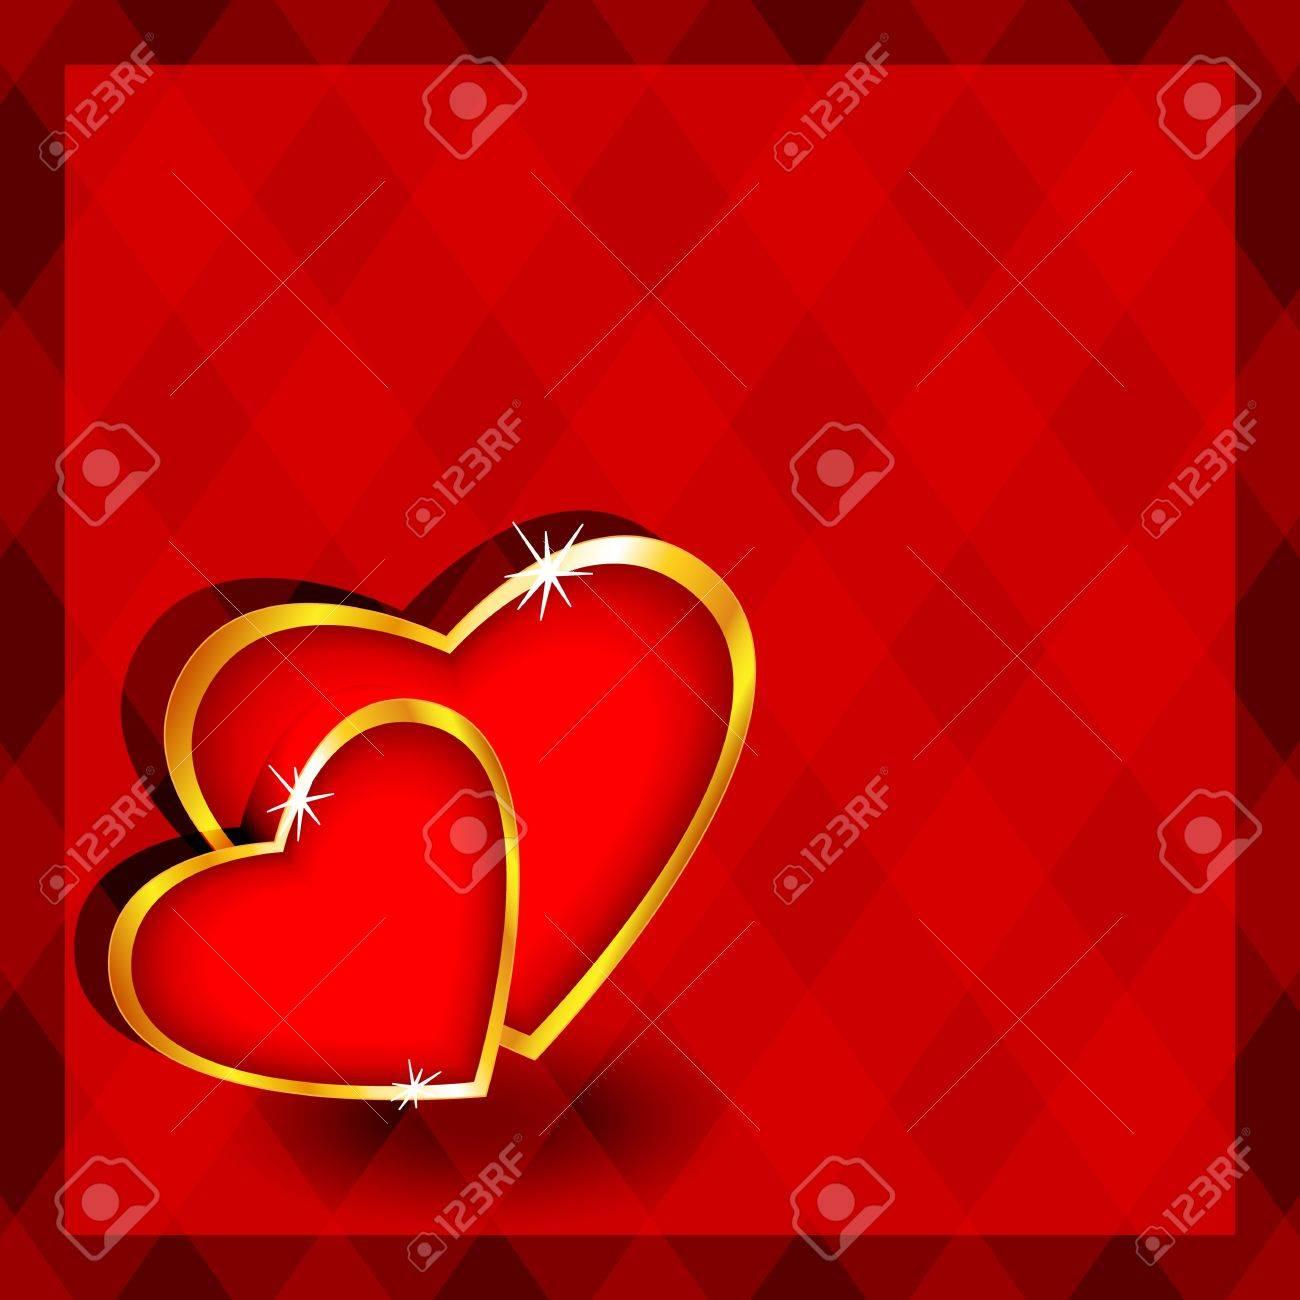 Red heart diamond shape symbol love valentine valentines red heart diamond shape symbol love valentine valentines day buycottarizona Images